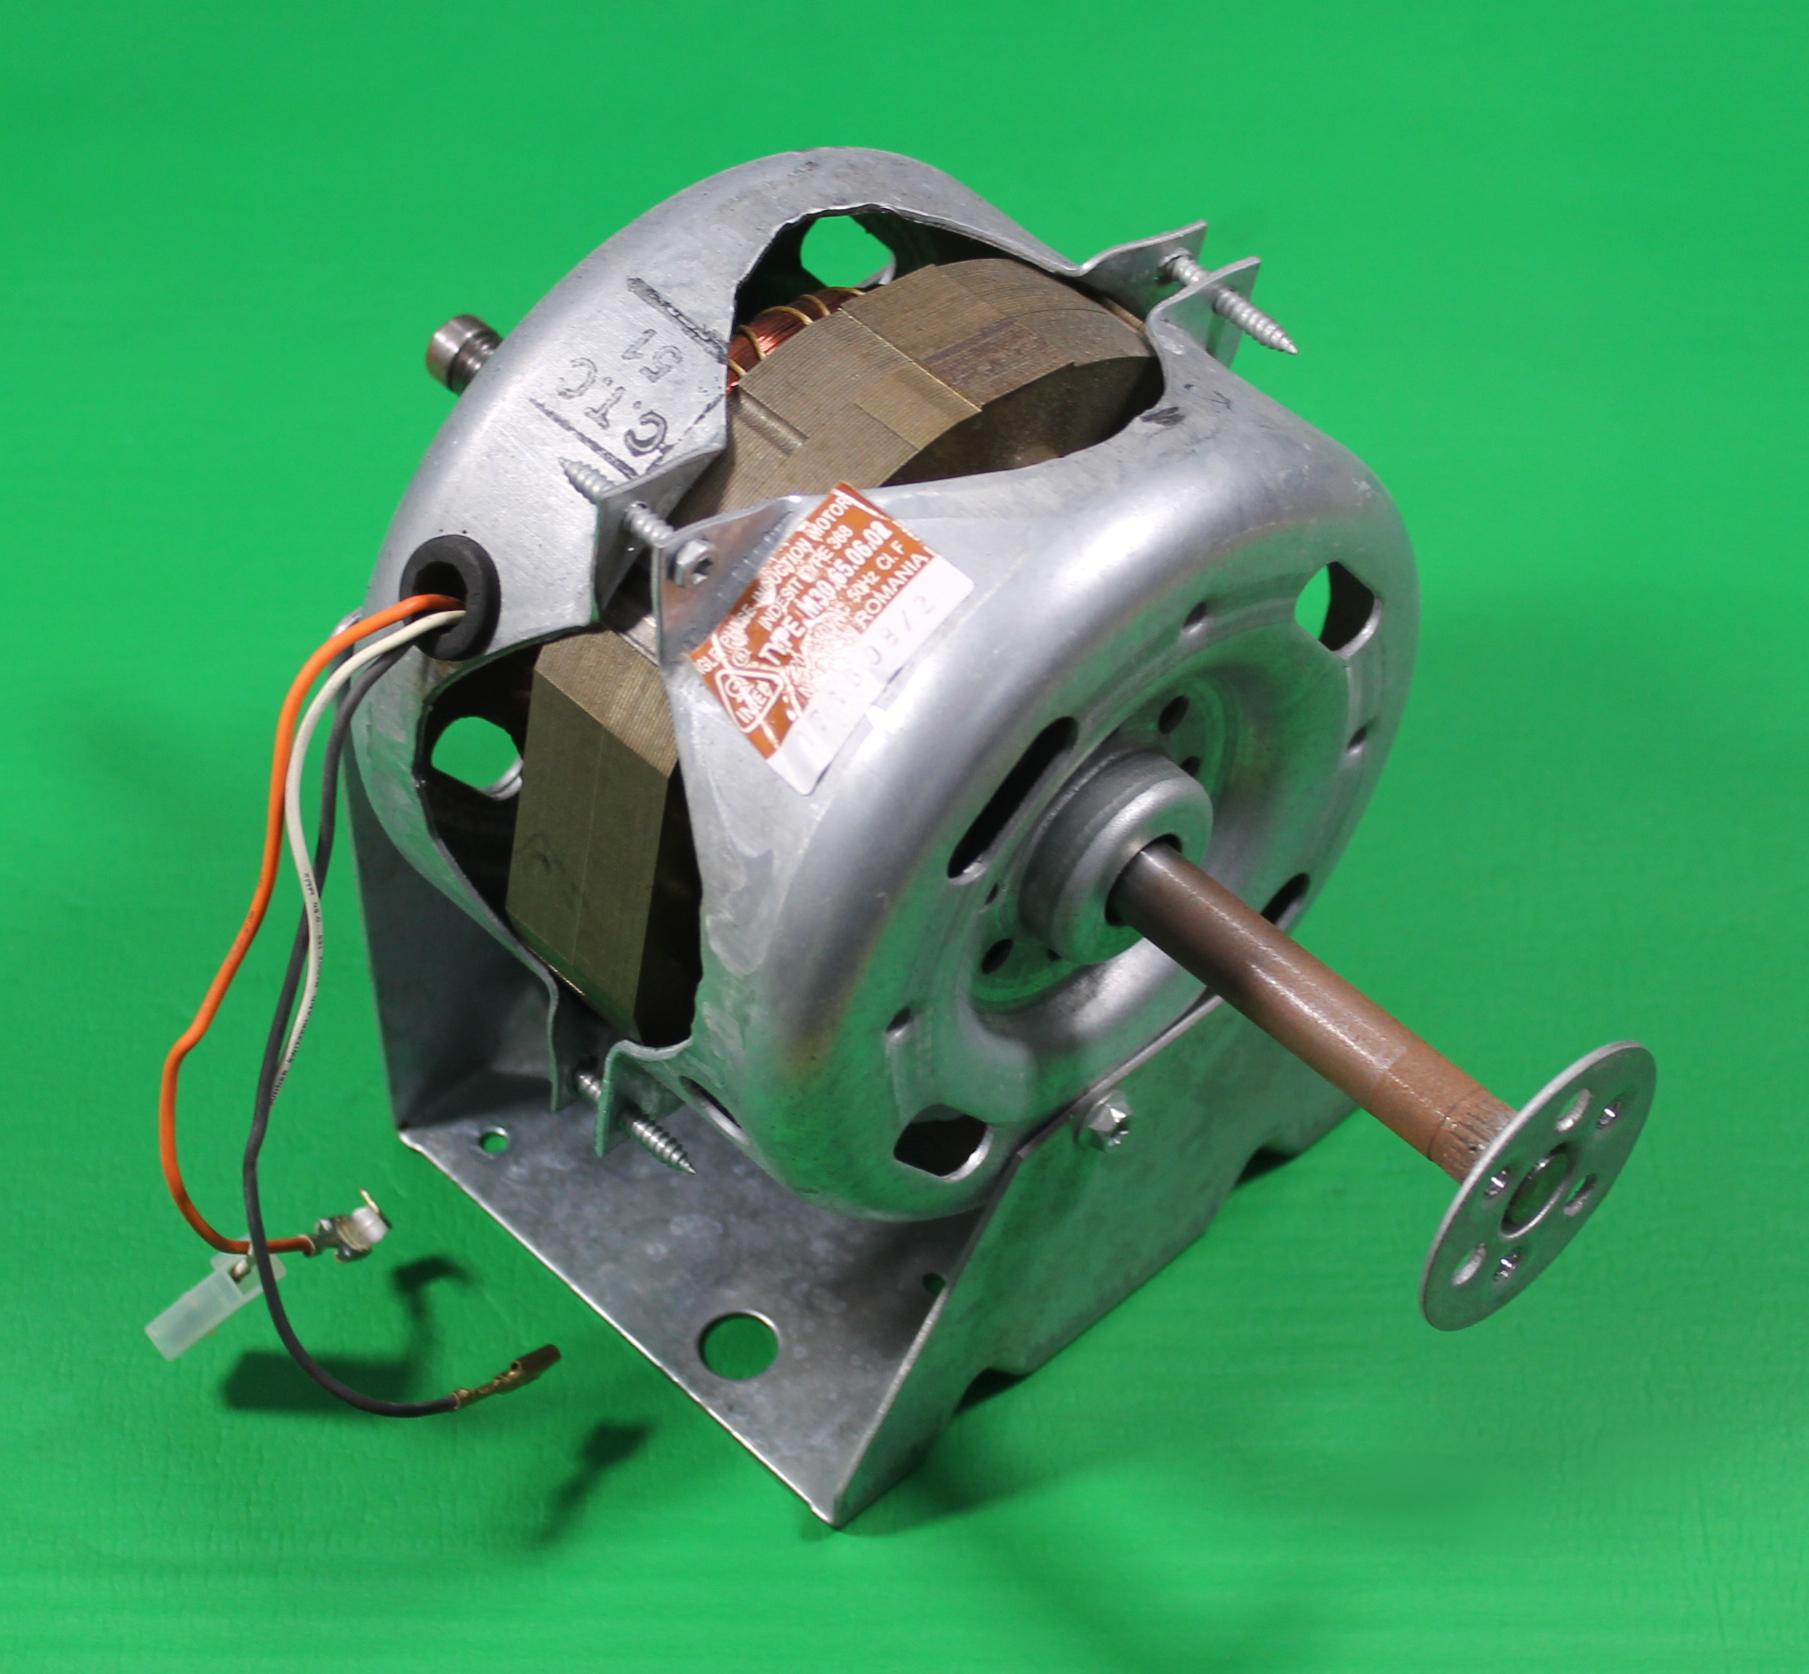 Hotpoint Vtd20 Tumble Dryer Motor Type 368 Ebay